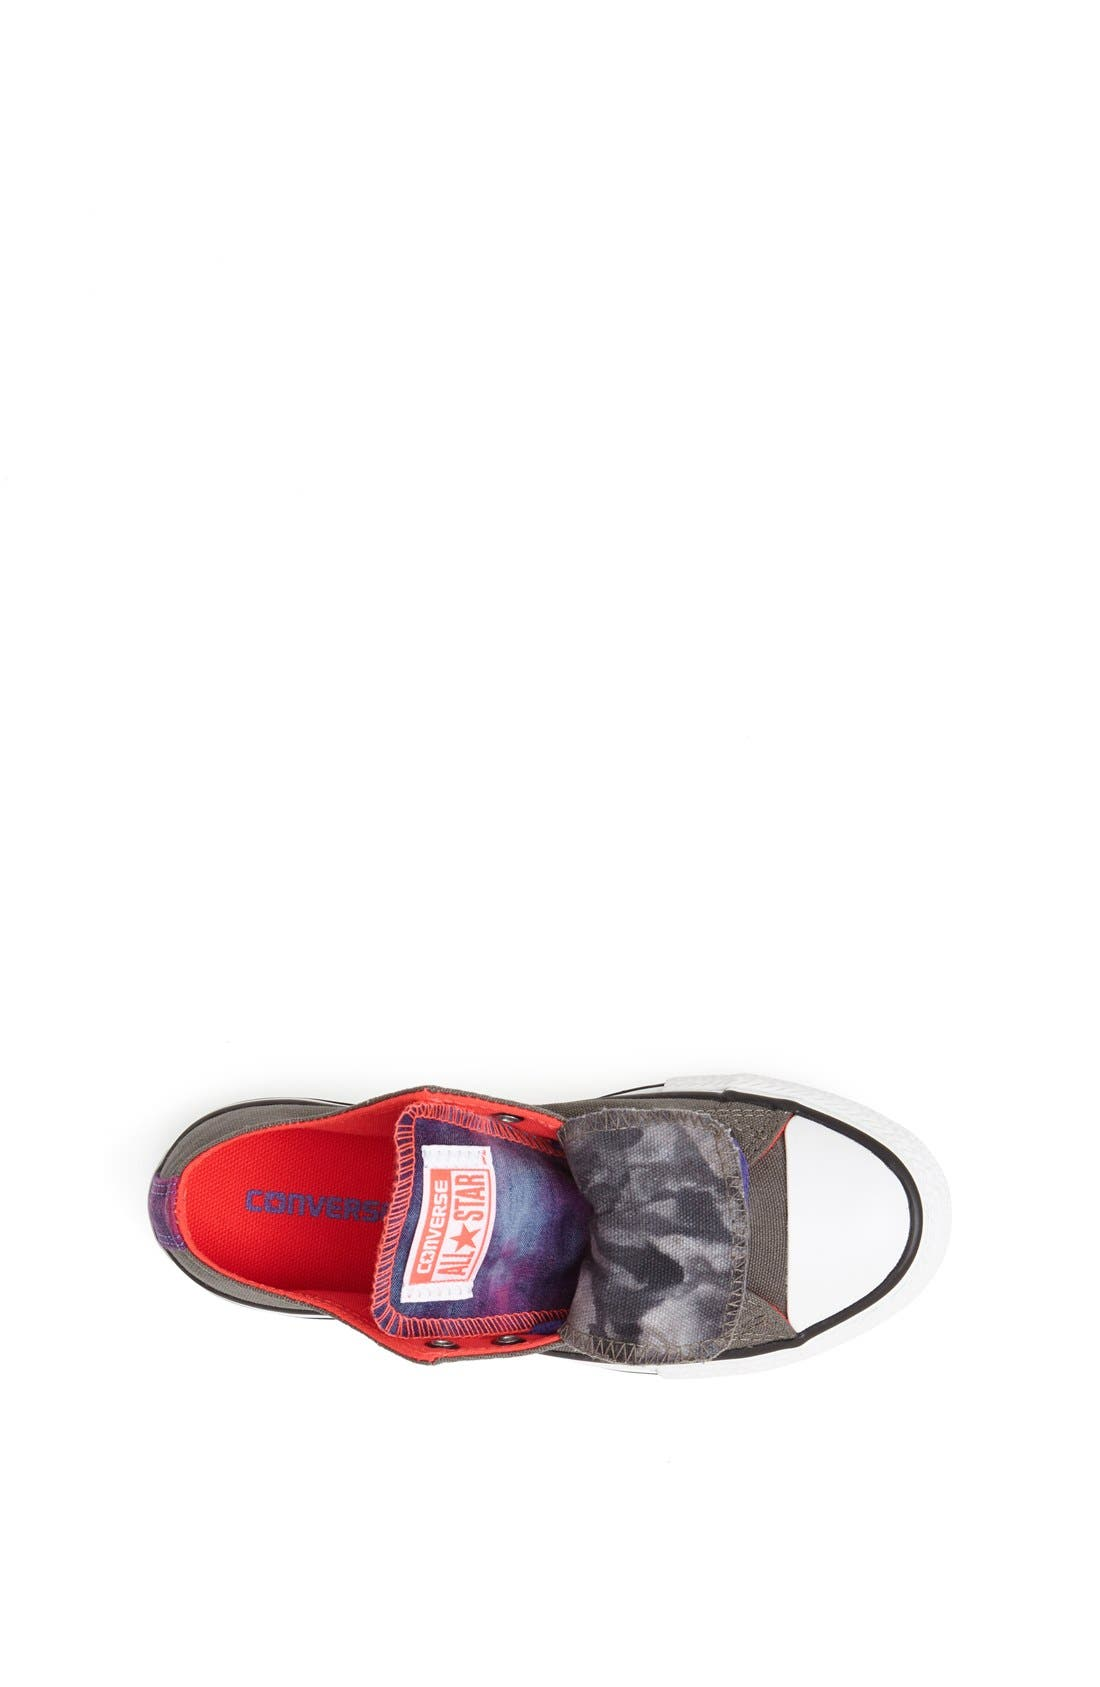 Alternate Image 2  - Converse Chuck Taylor® Double Zip Sneaker (Toddler, Little Kid & Big Kid)